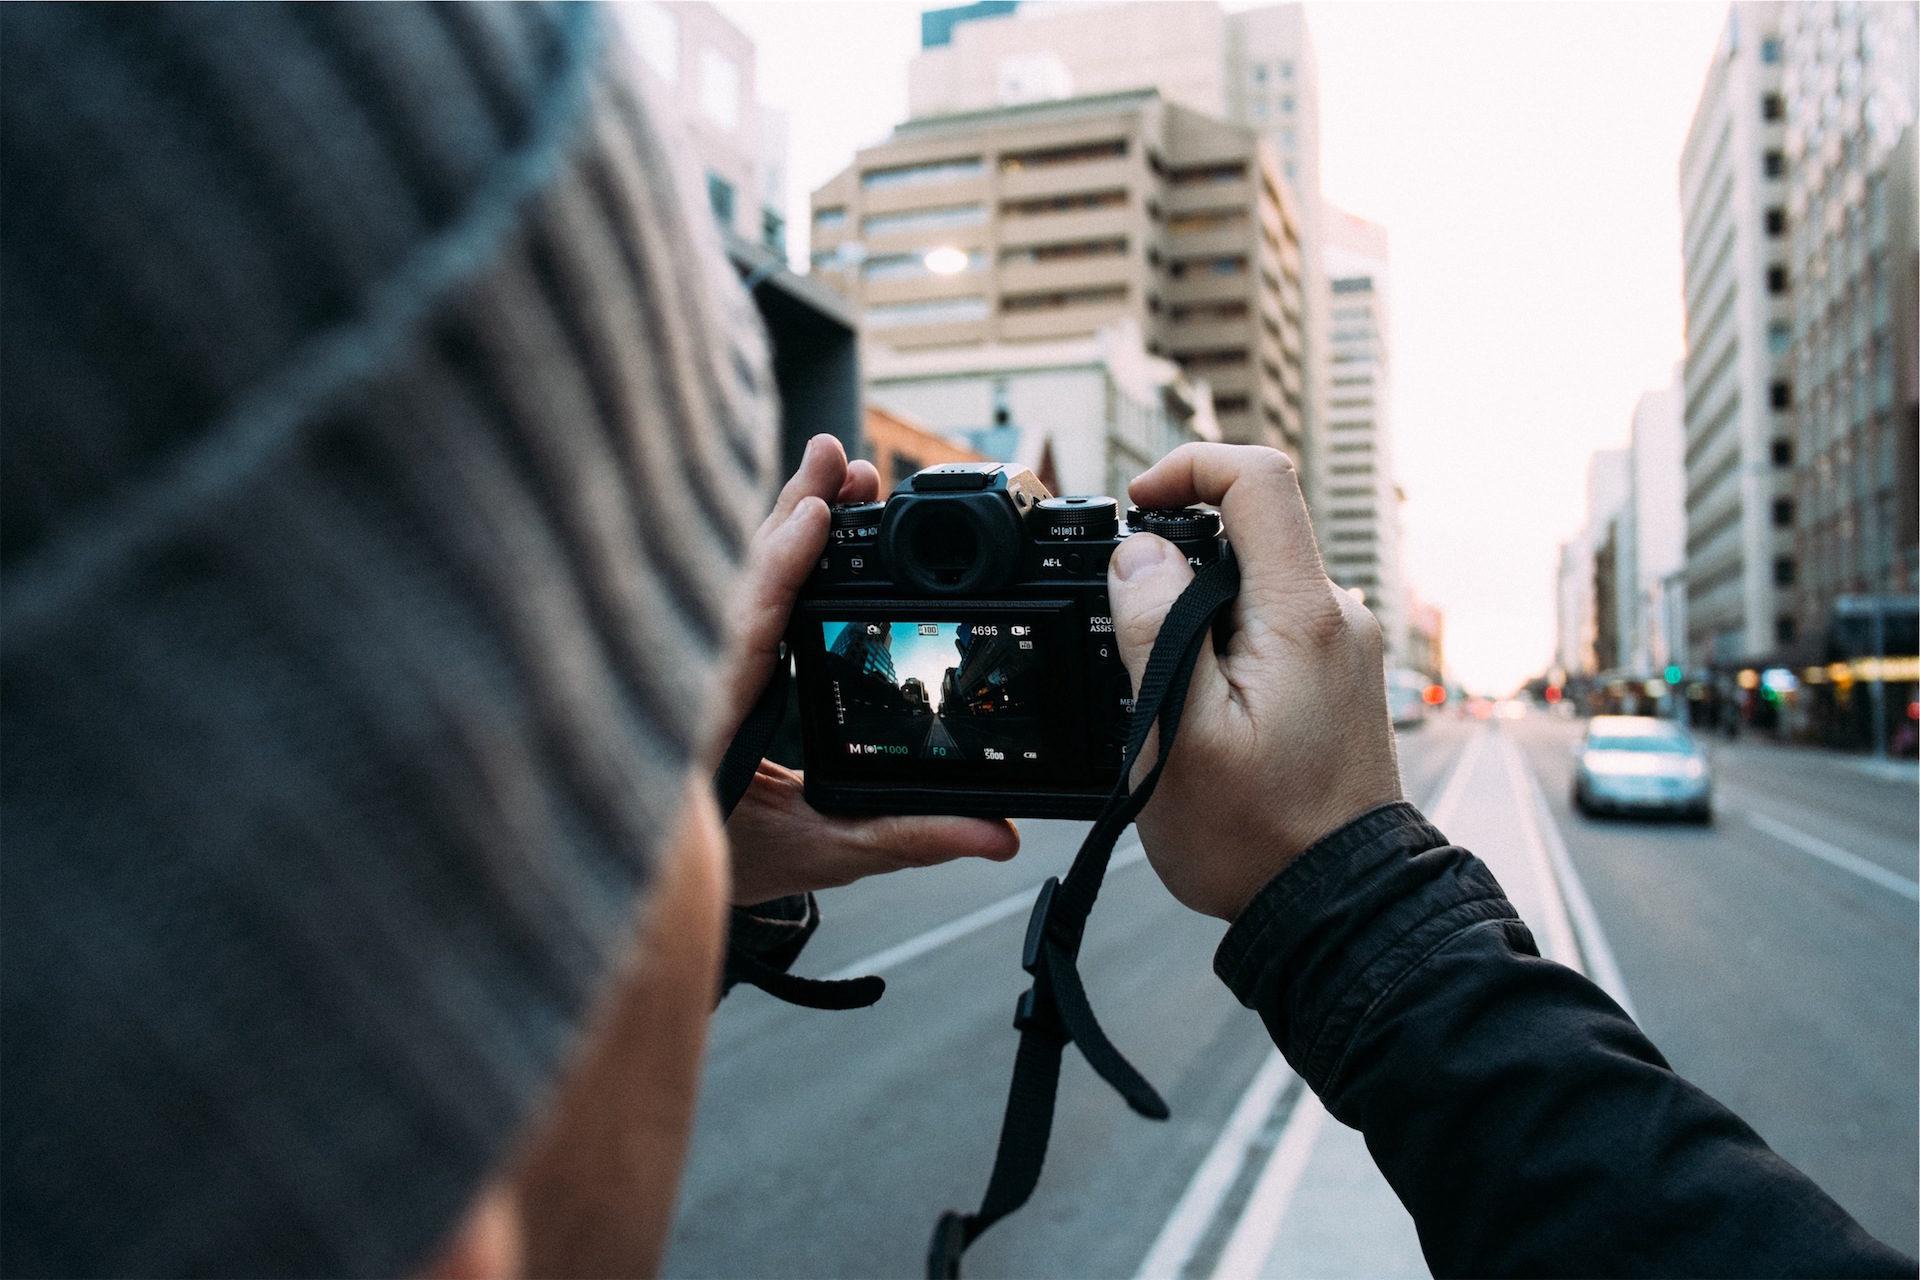 शहर, आदमी, कैमरा, फोटोग्राफी, turismo - HD वॉलपेपर - प्रोफेसर-falken.com